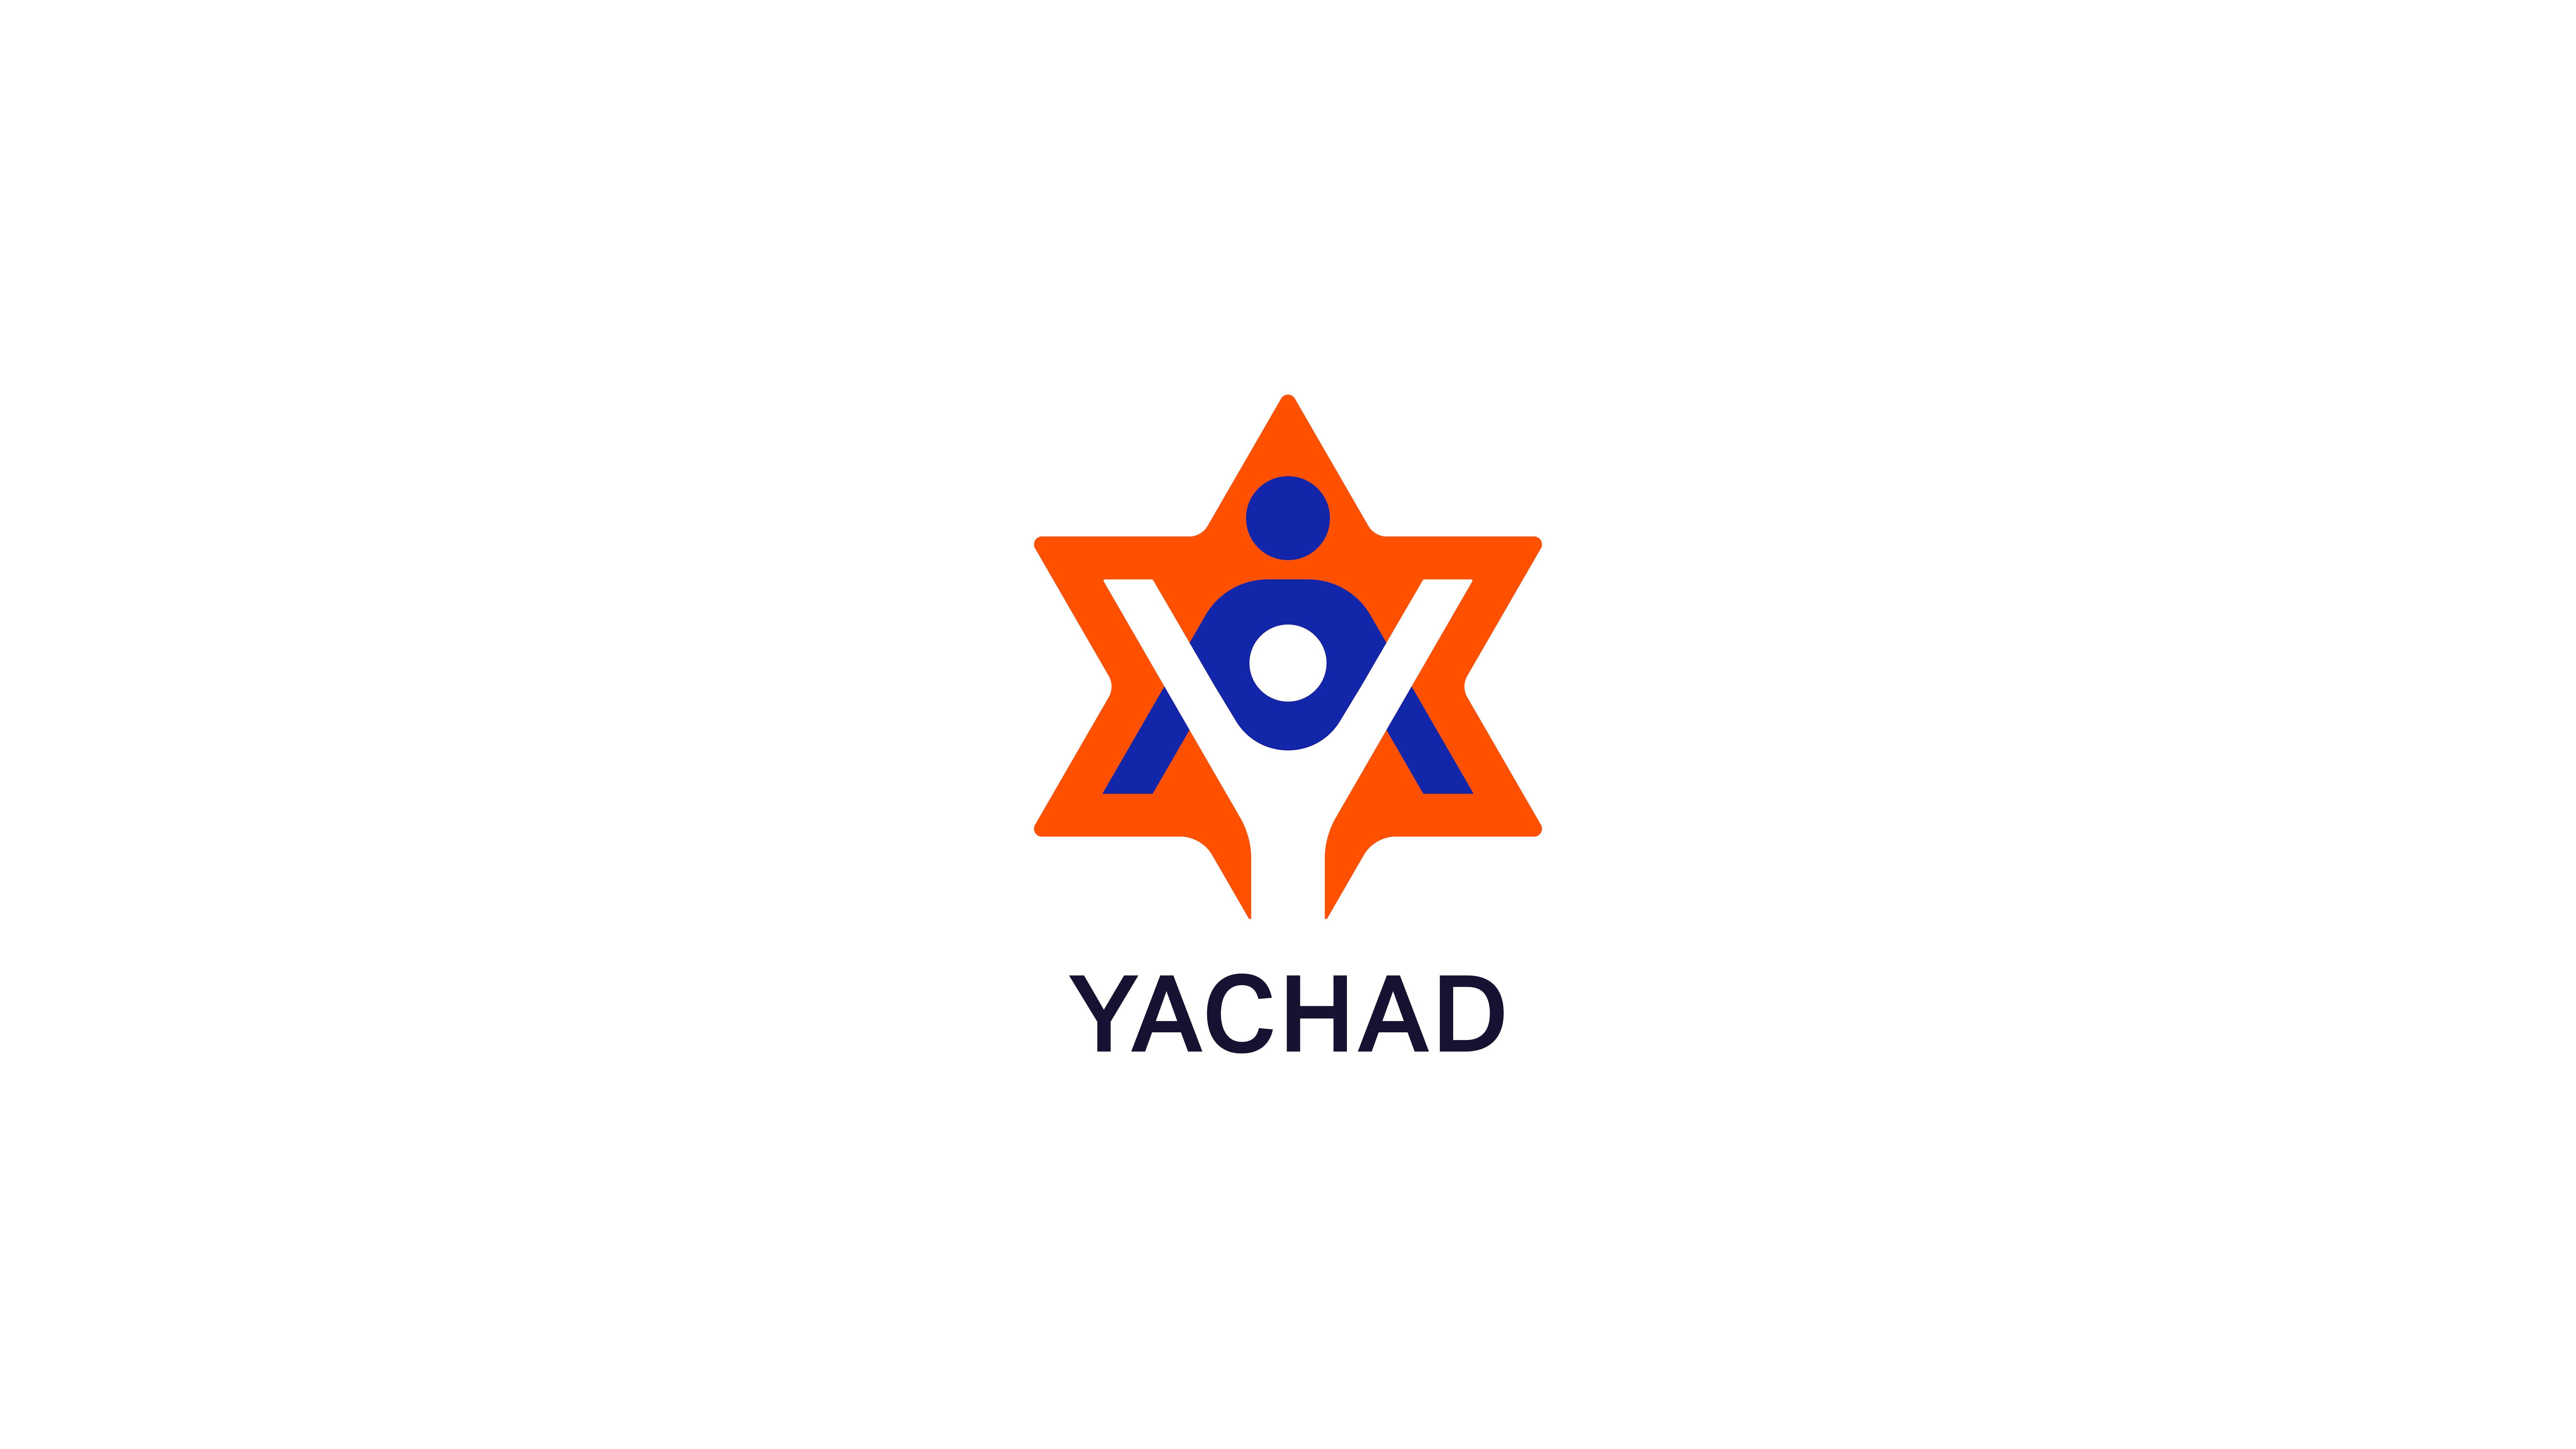 Yachad-Case-Study-2